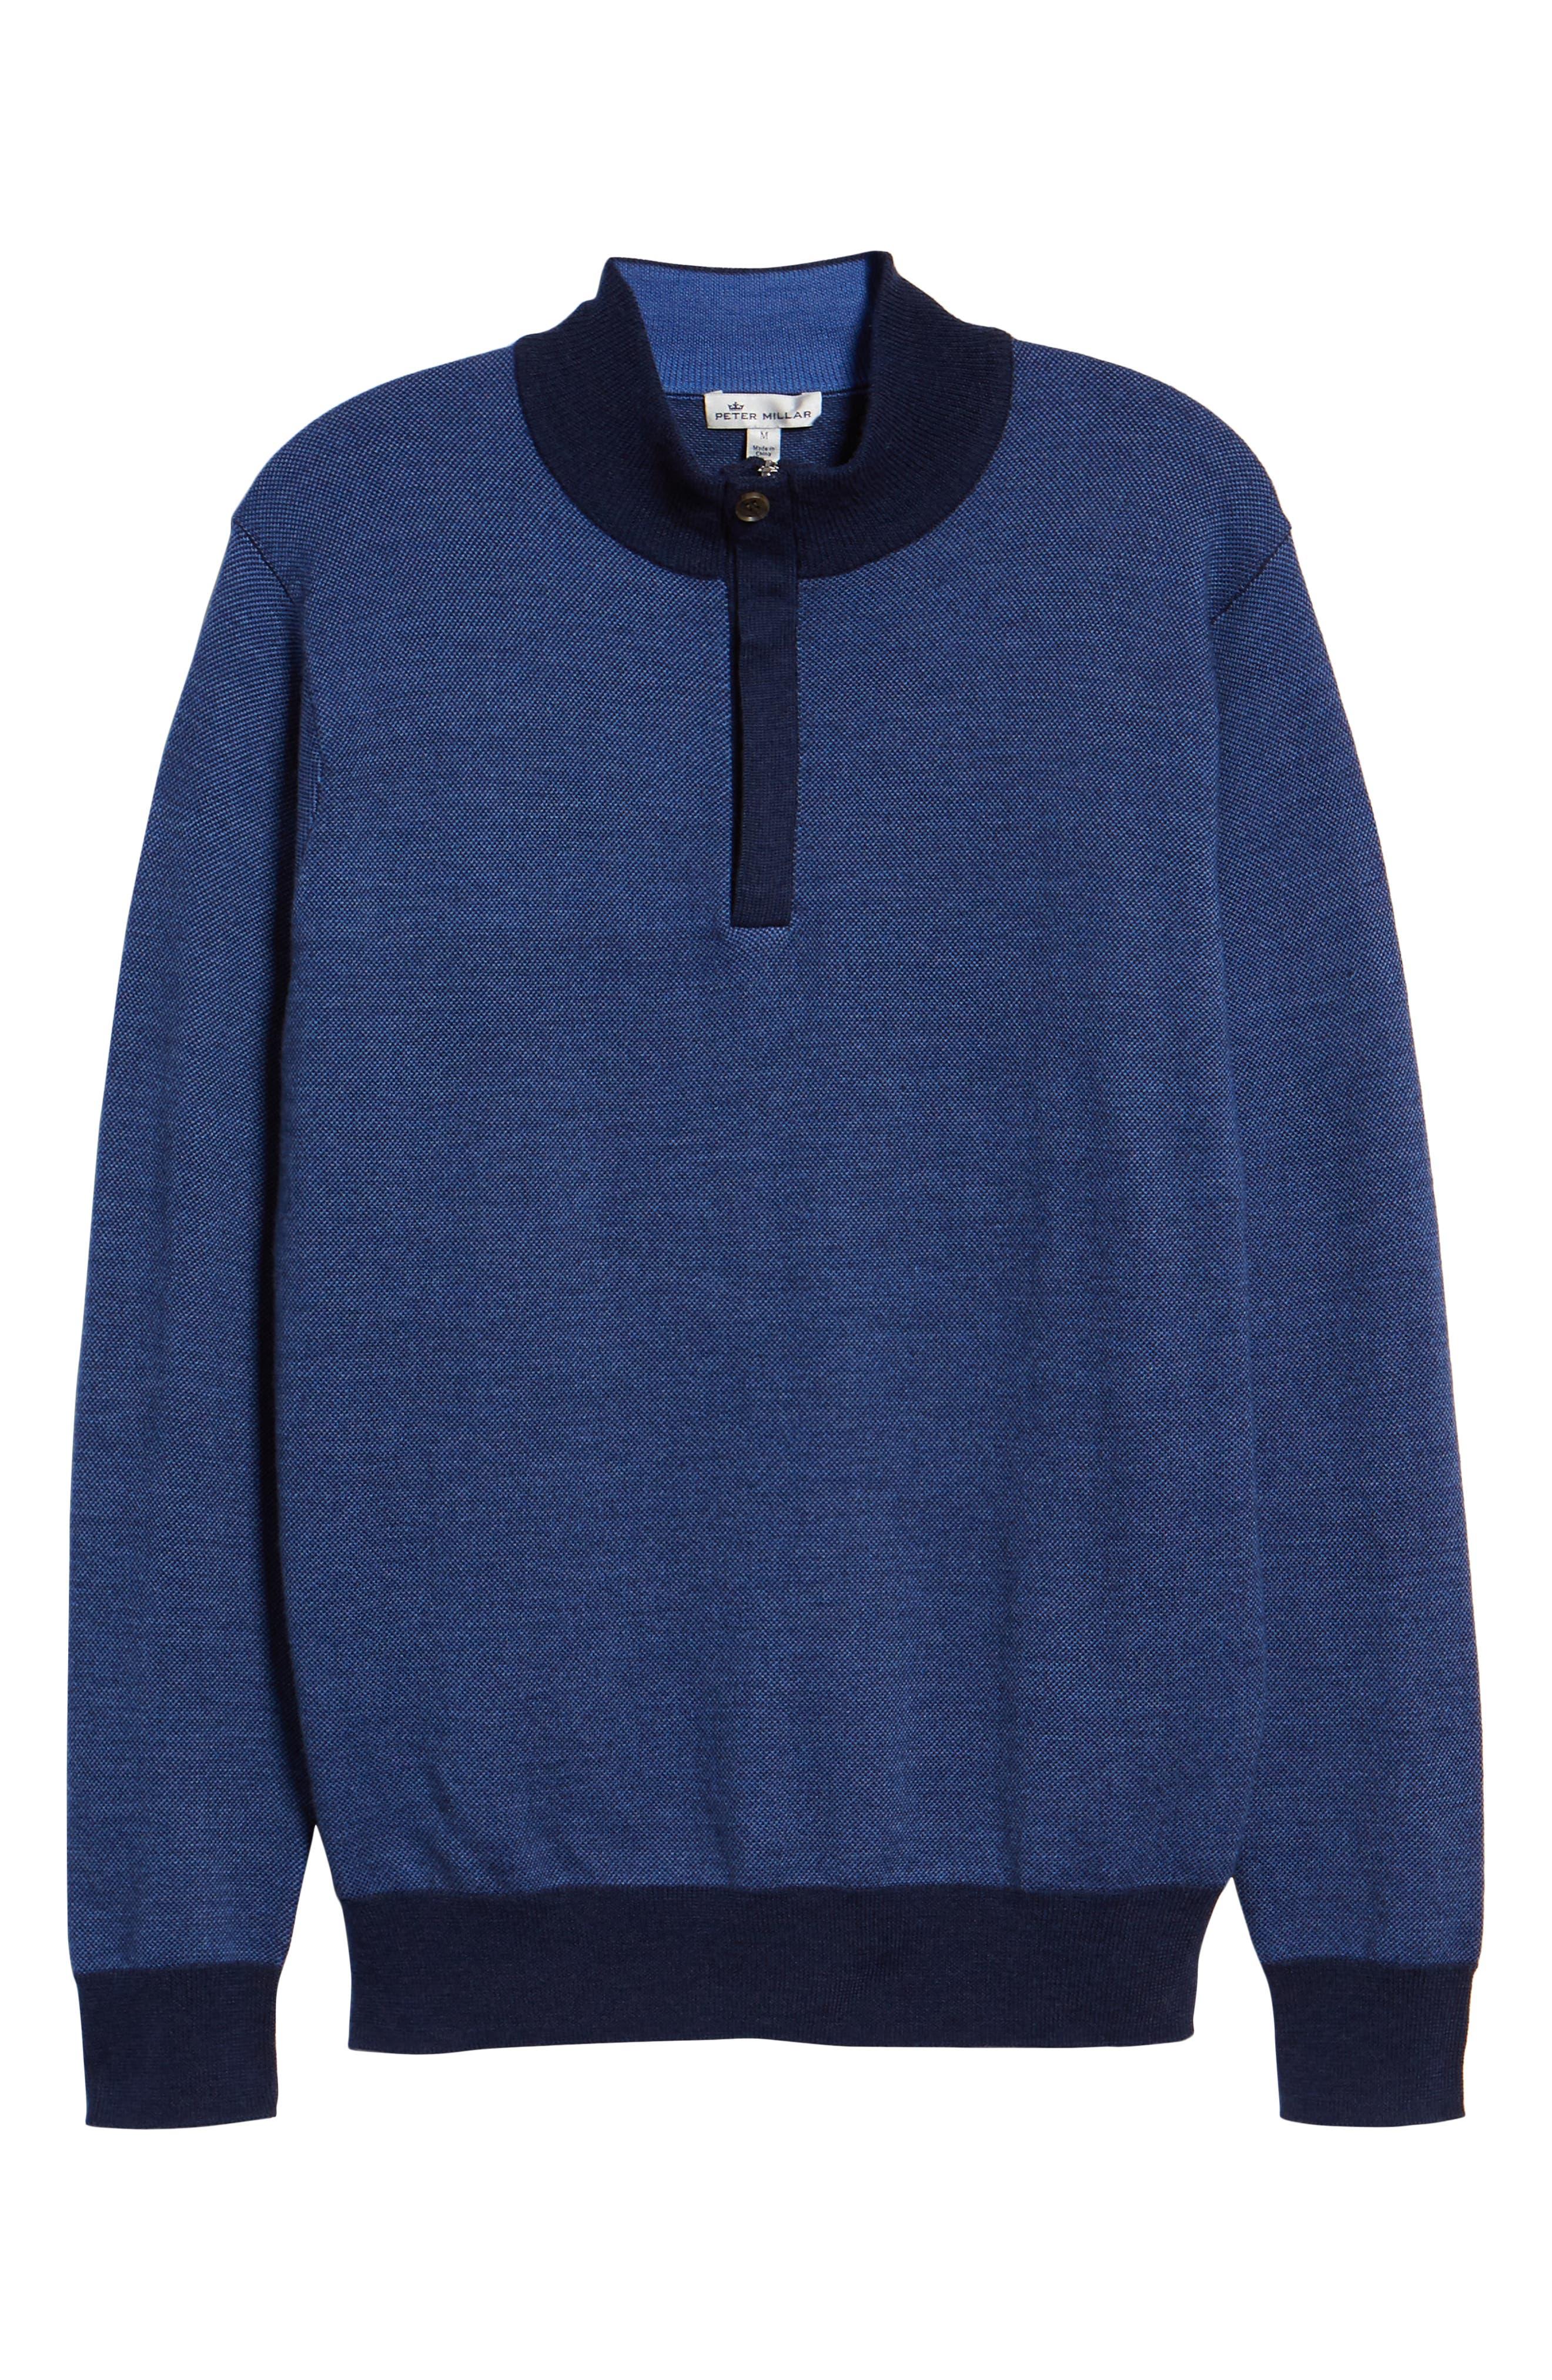 Birdseye Merino Wool Quarter Zip Sweater,                             Alternate thumbnail 6, color,                             PLAZA BLUE